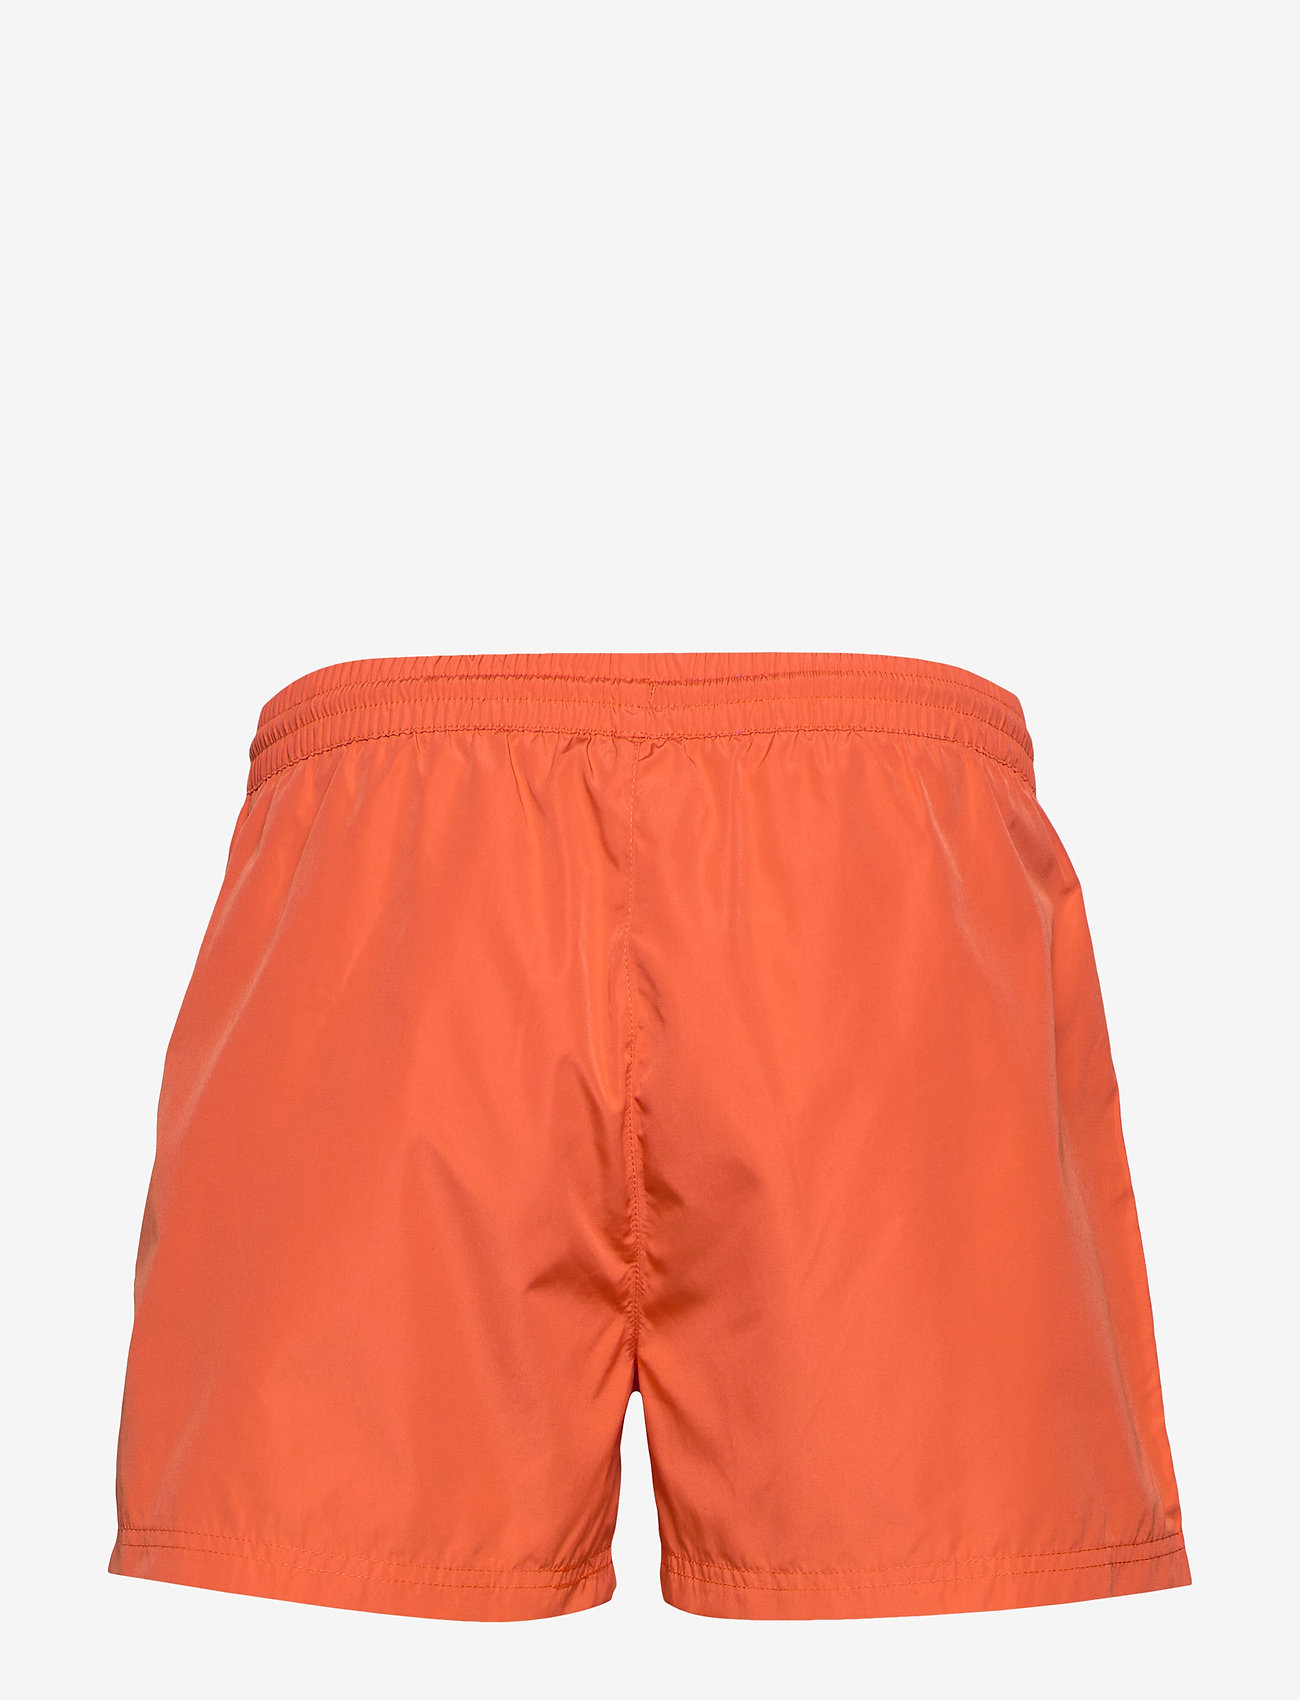 Men Michi Beach Shorts (Tigerlily) - FILA JVJTWz